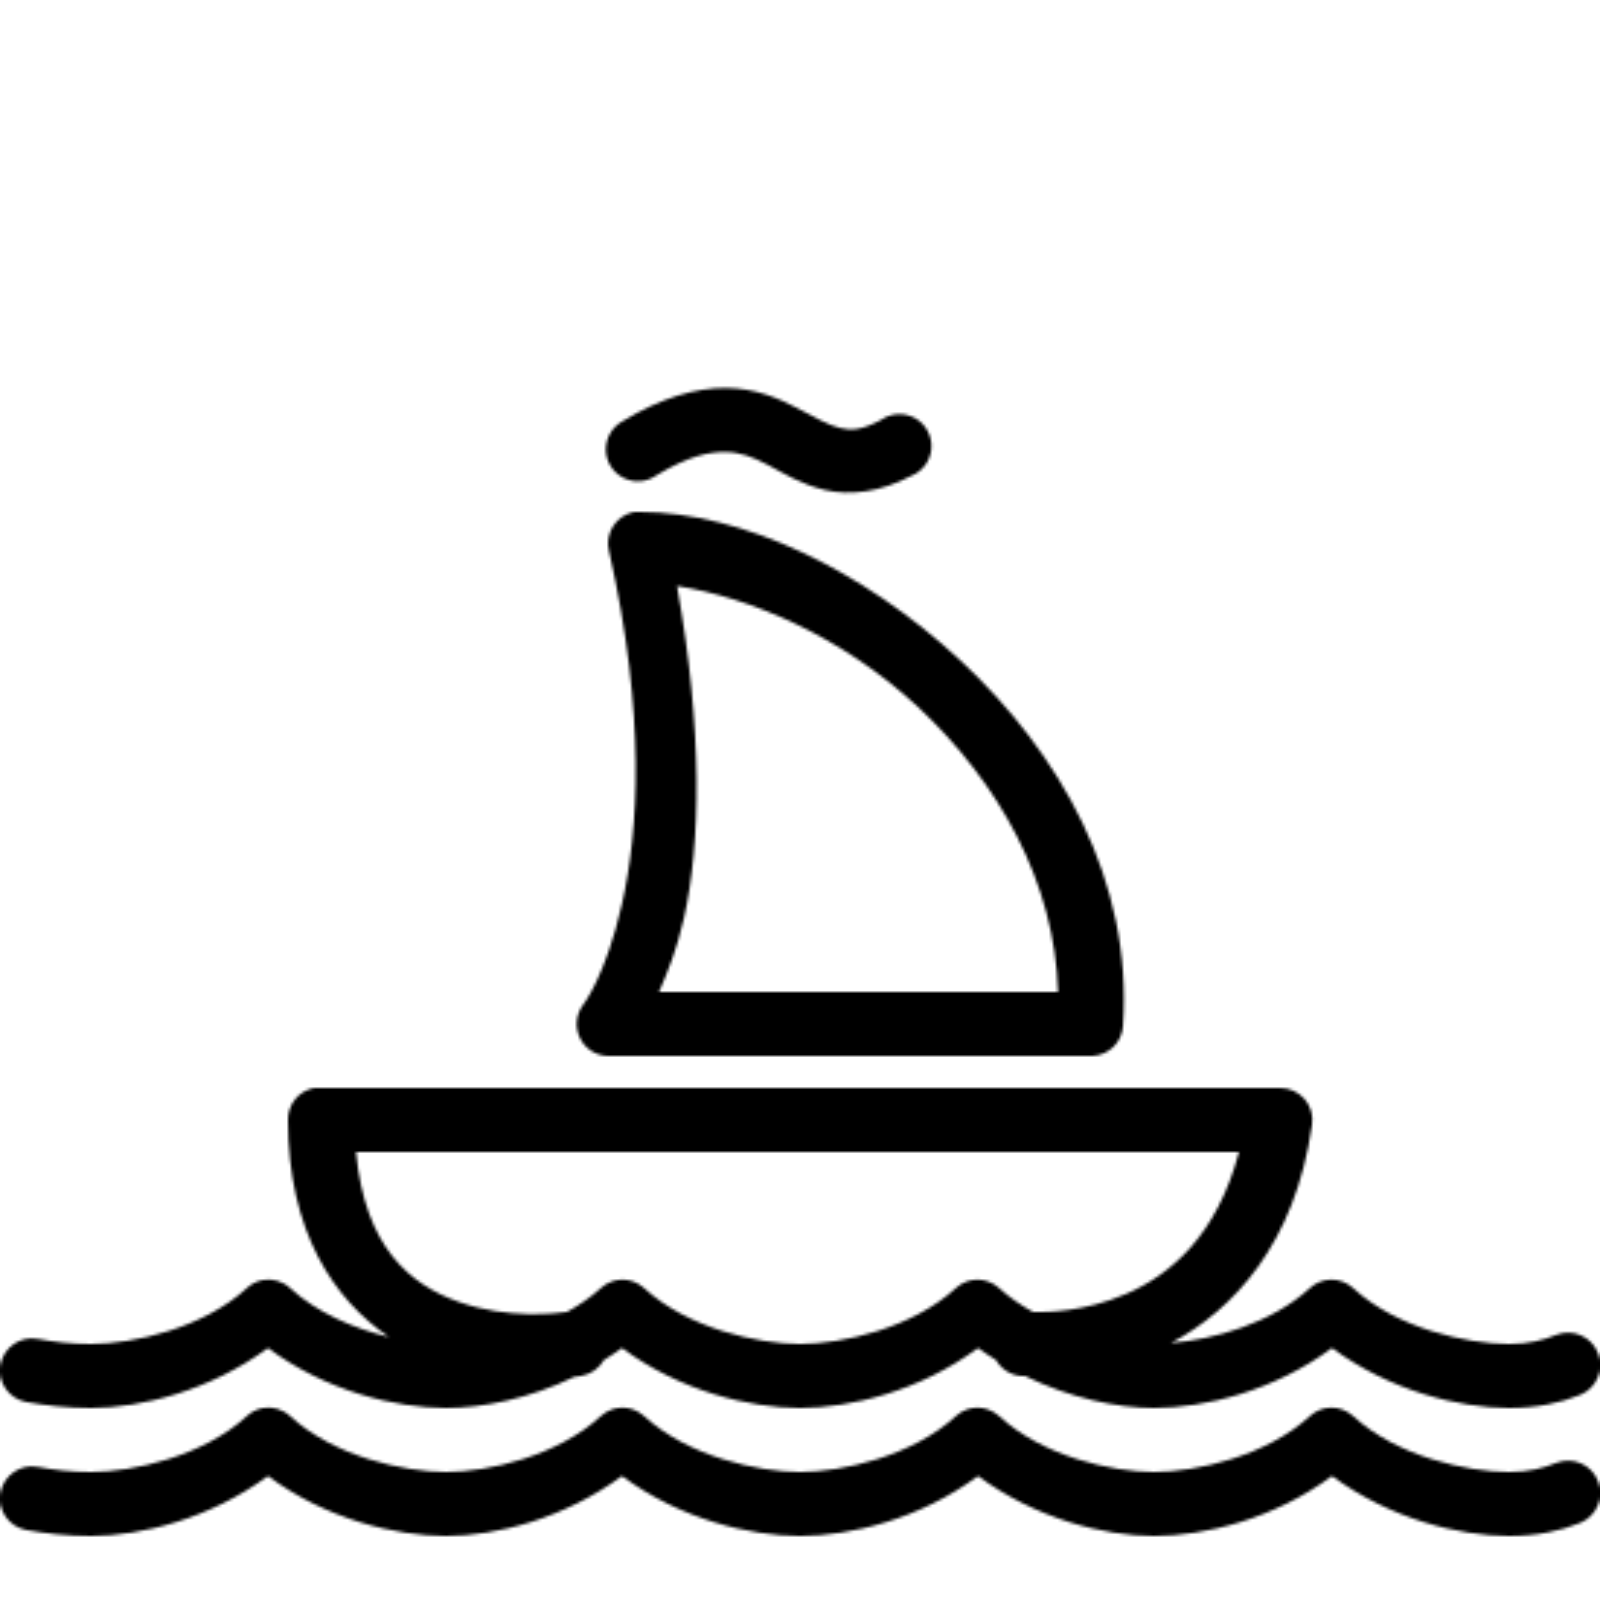 Icone Sailing Ship